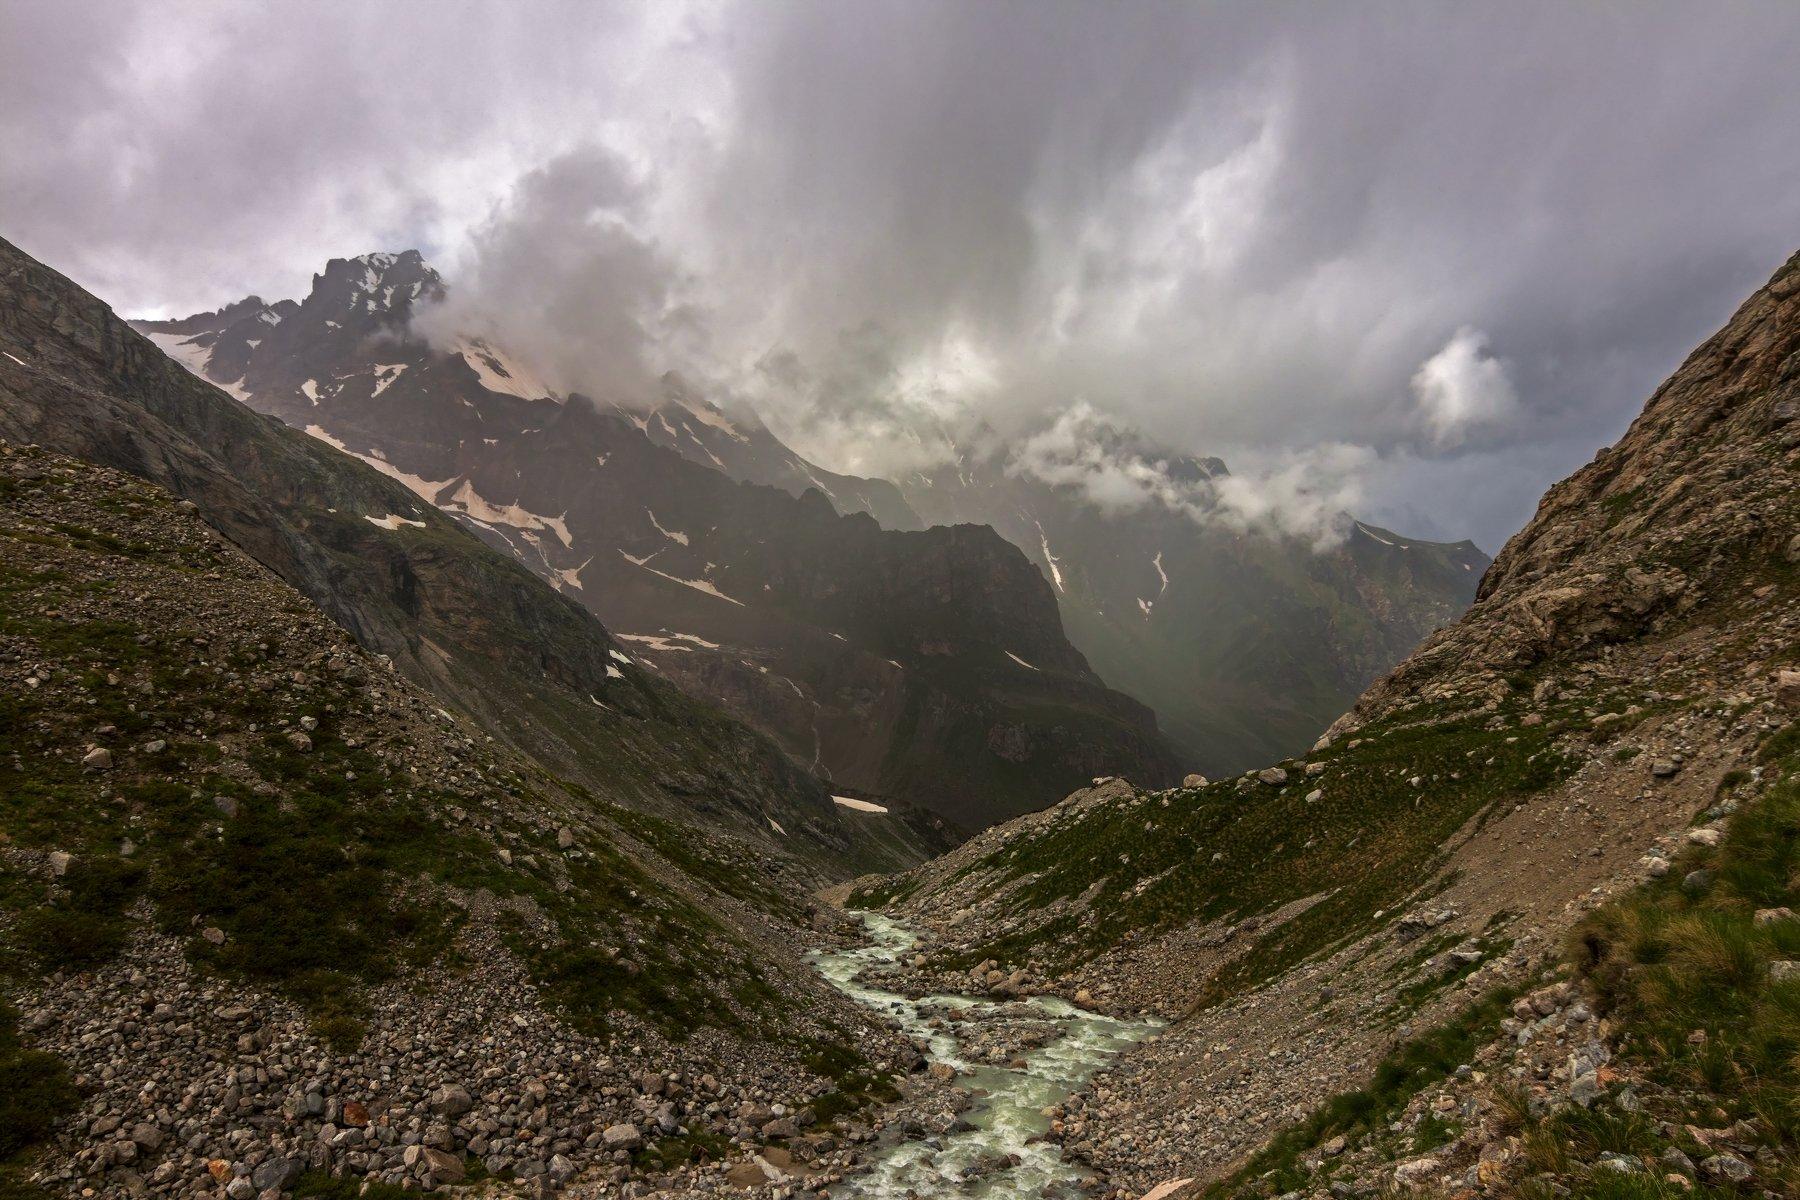 горы, дождь, кавказ, река, Эстелла